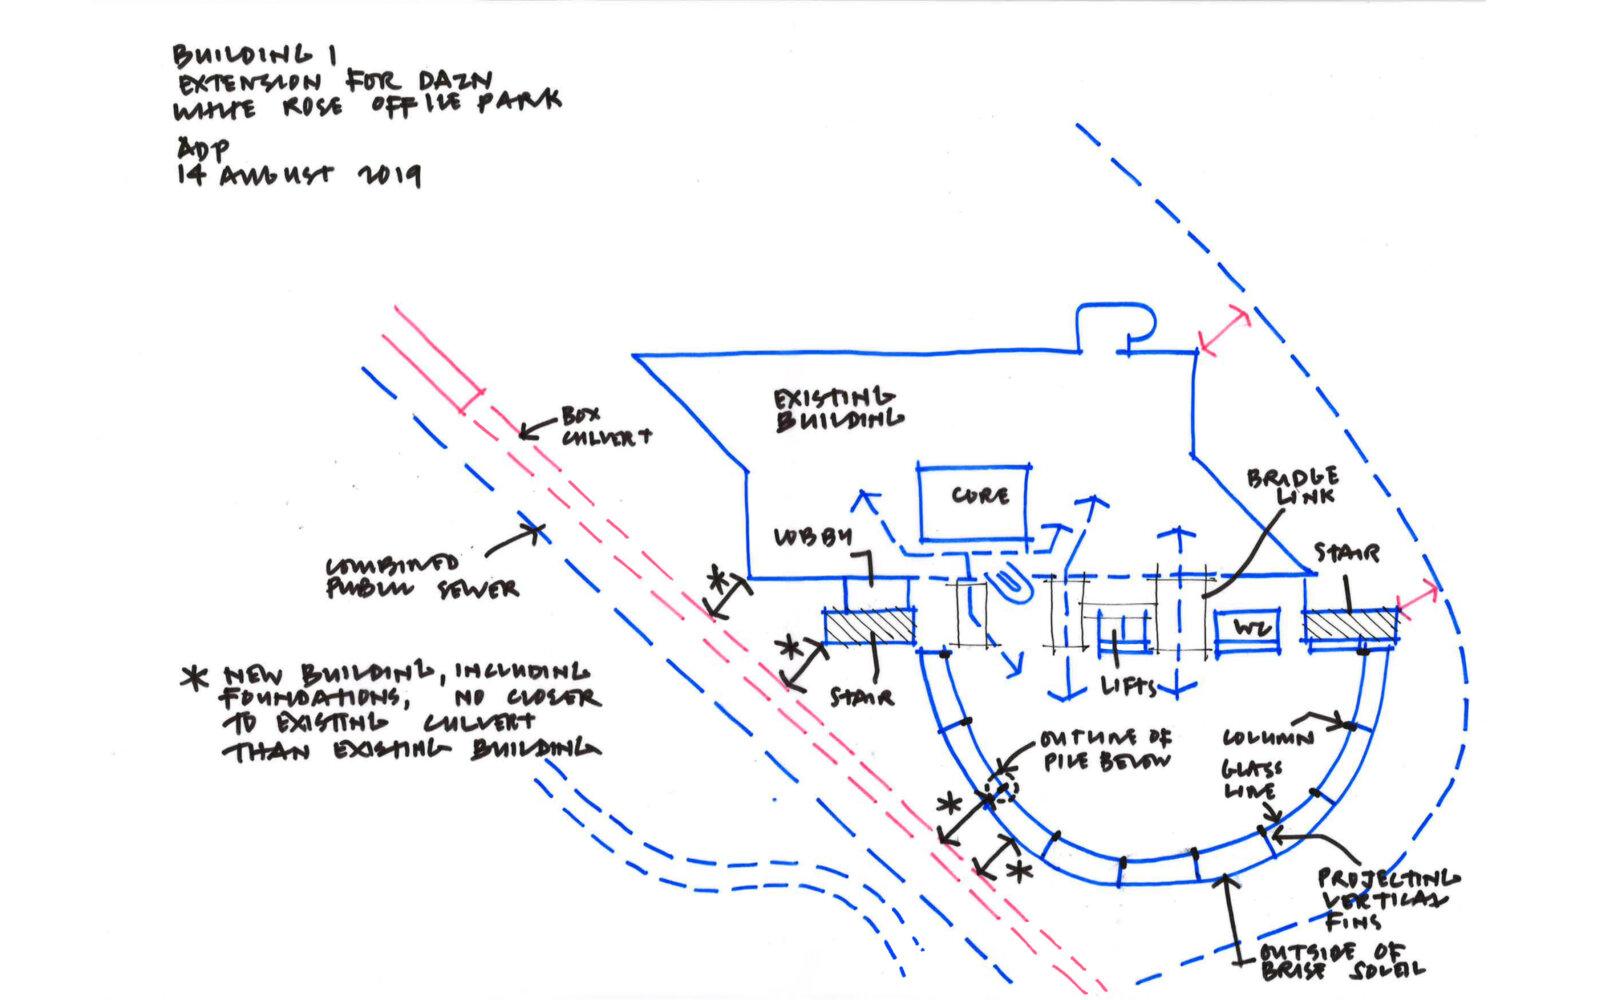 Office Building Extension Munroe K Ltd White Rose Office Park sketch